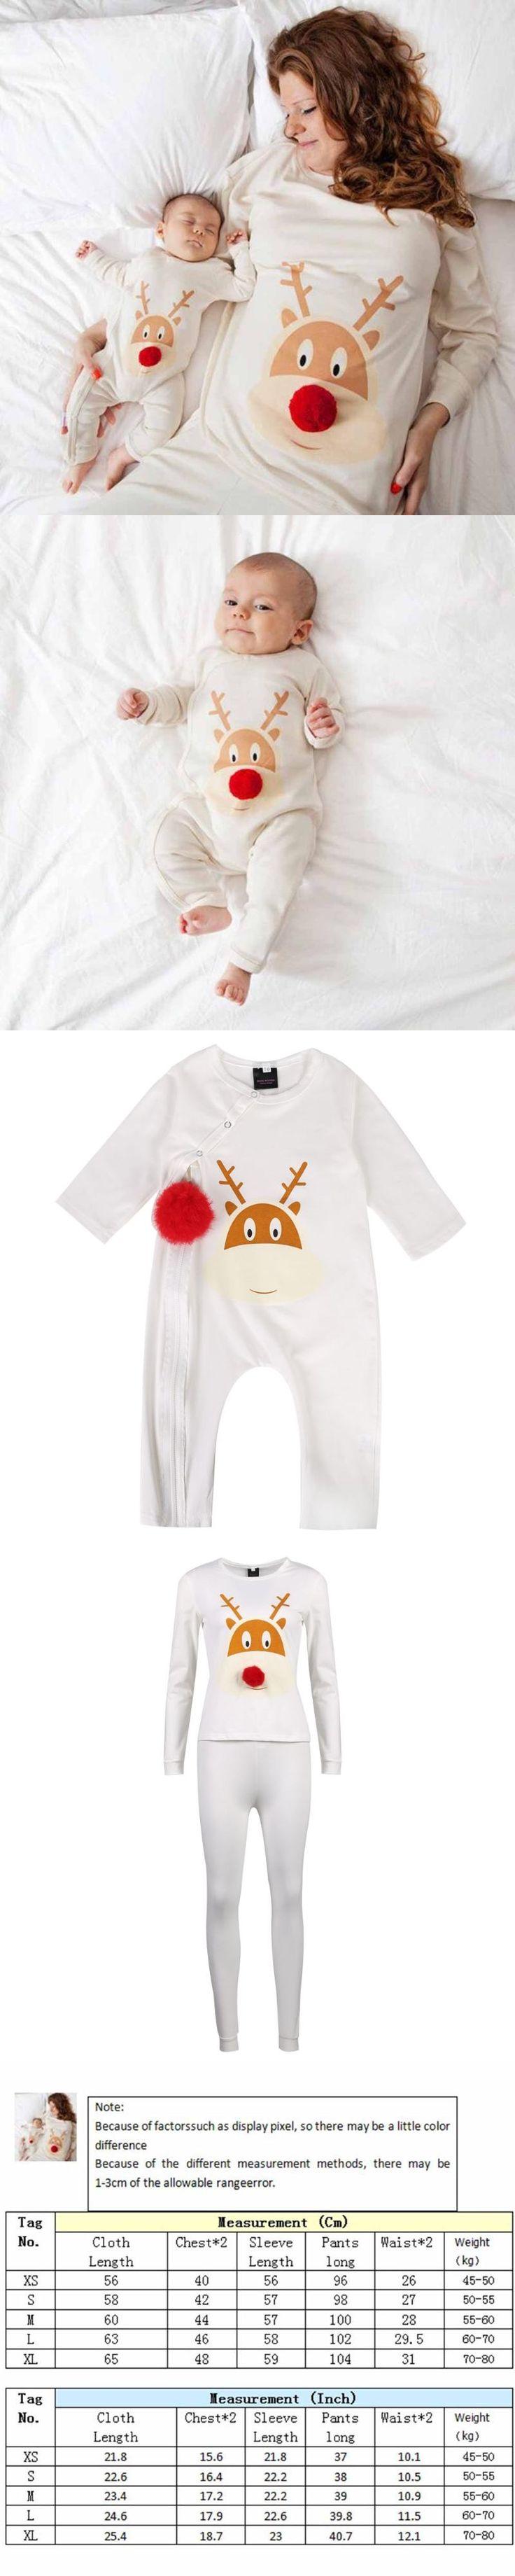 Christmas Winter Deer Printing Family Matching Christmas Pajamas Set Outfit Mom T-shirt Pants Sleepwear And Baby Kids Romper